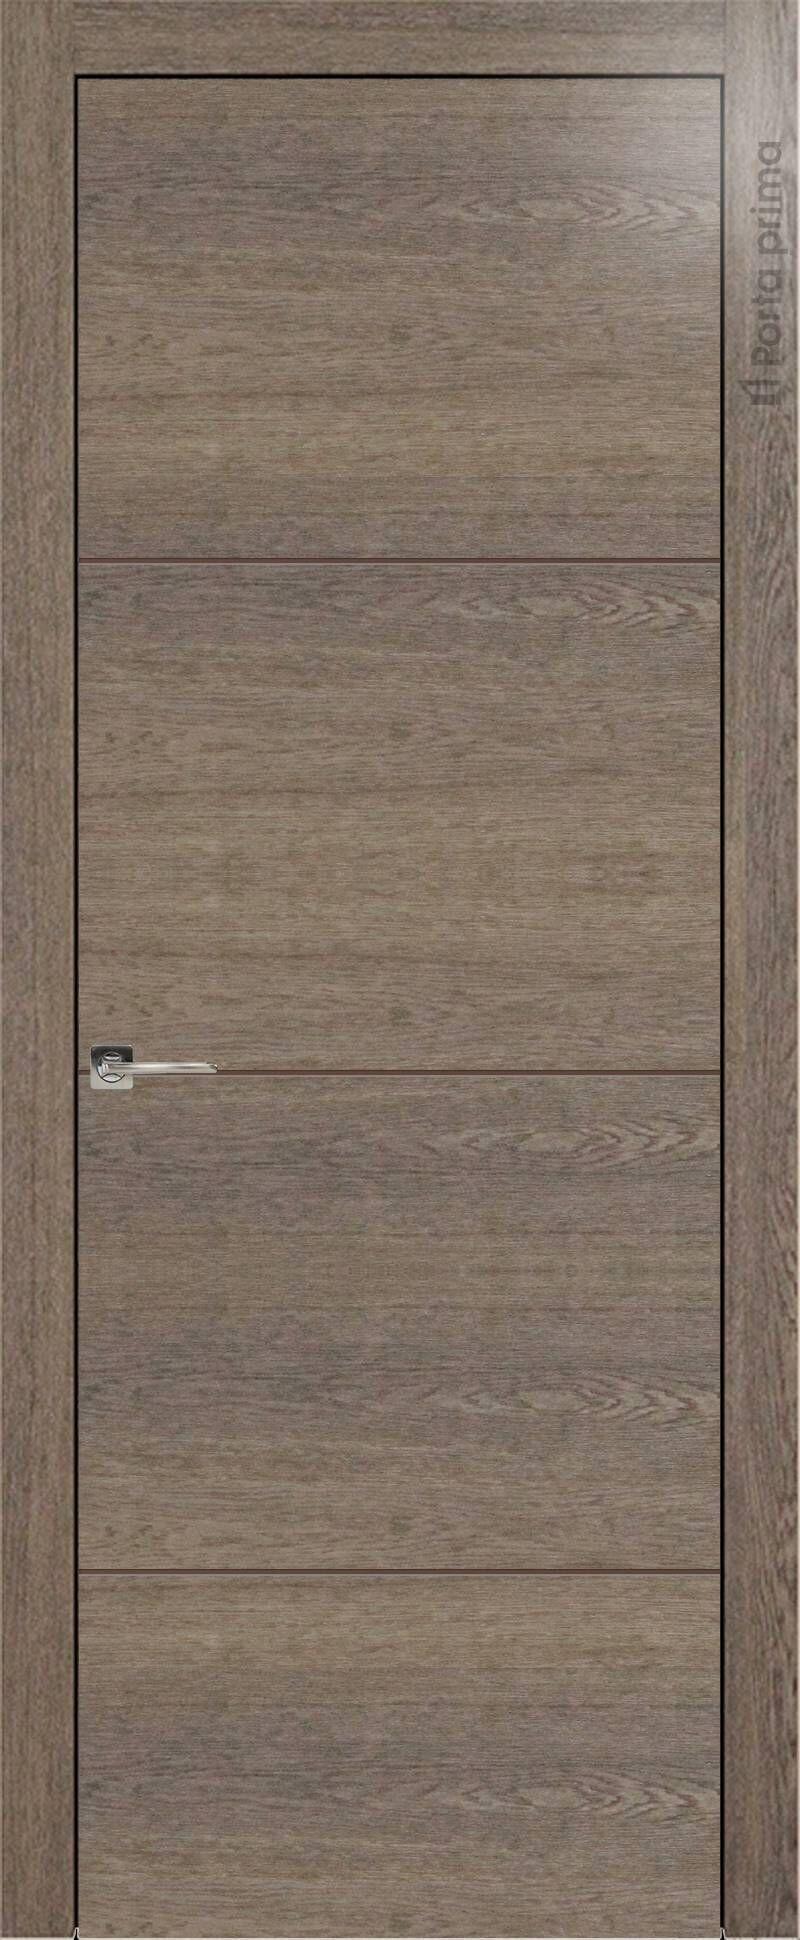 Tivoli Г-2 цвет - Дуб антик Без стекла (ДГ)